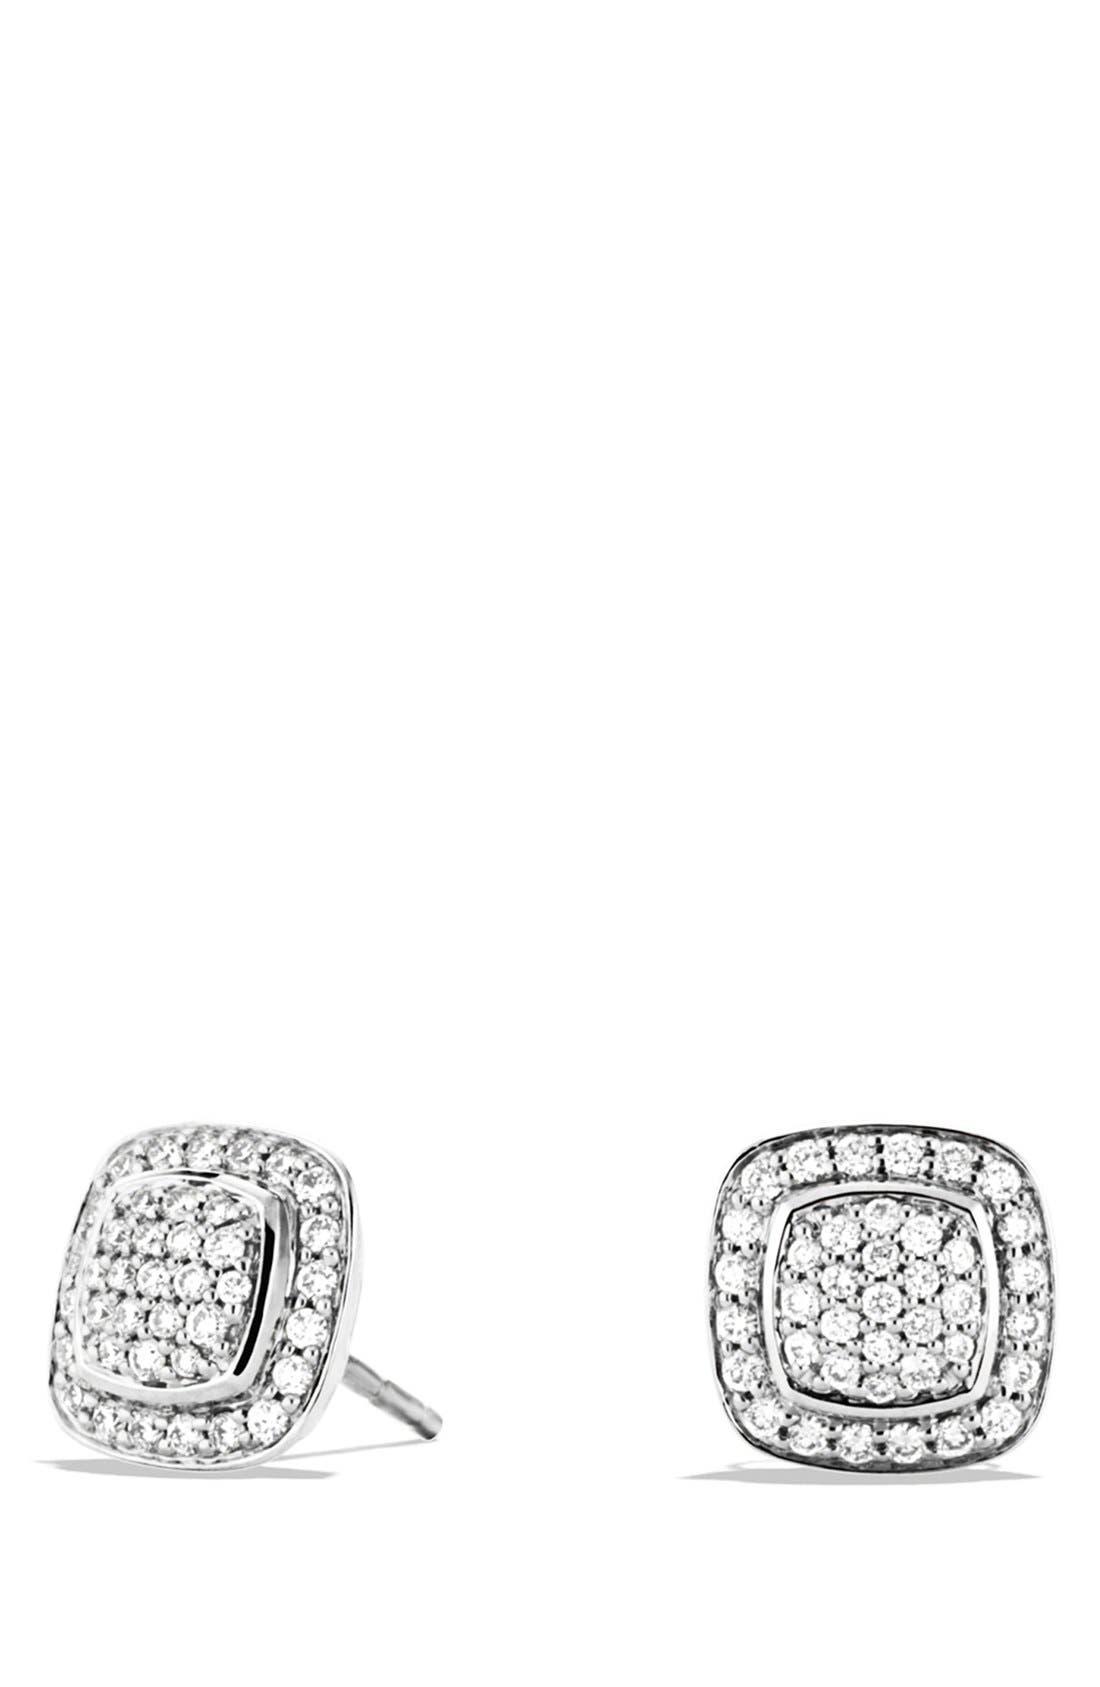 Main Image - David Yurman 'Albion' Earrings with Diamonds